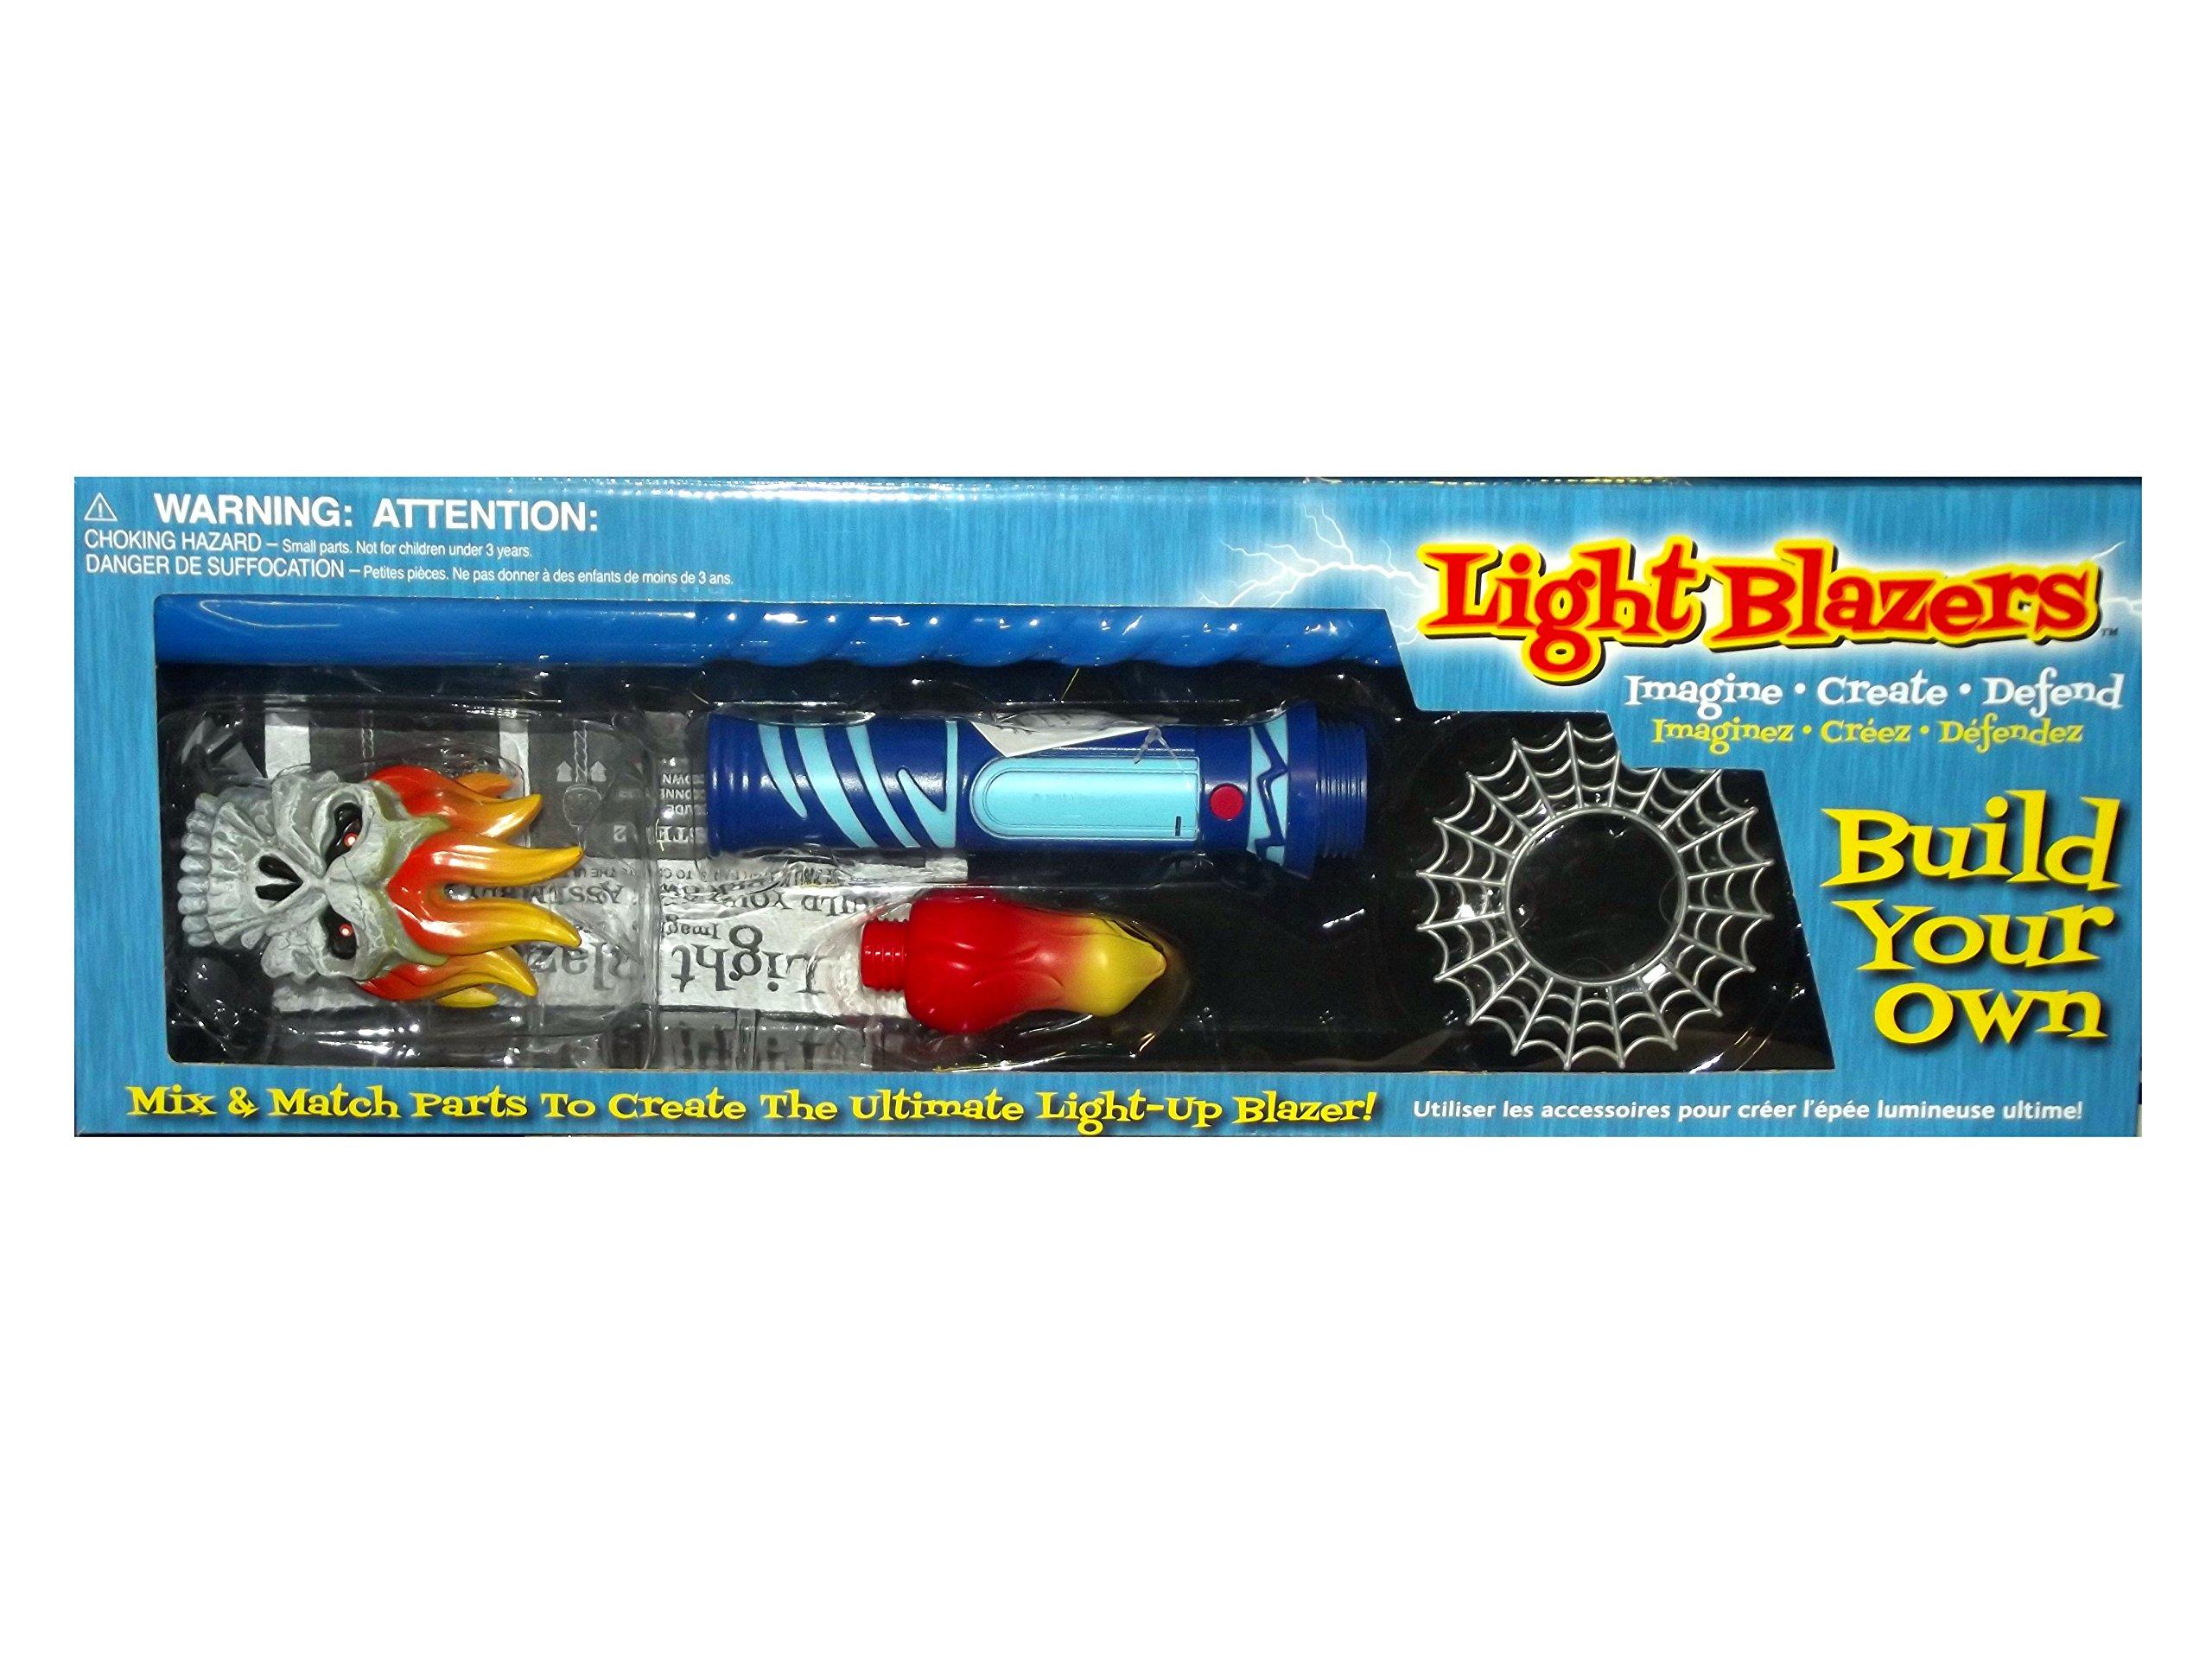 Light Blazers Build Your Own Blazer Sword